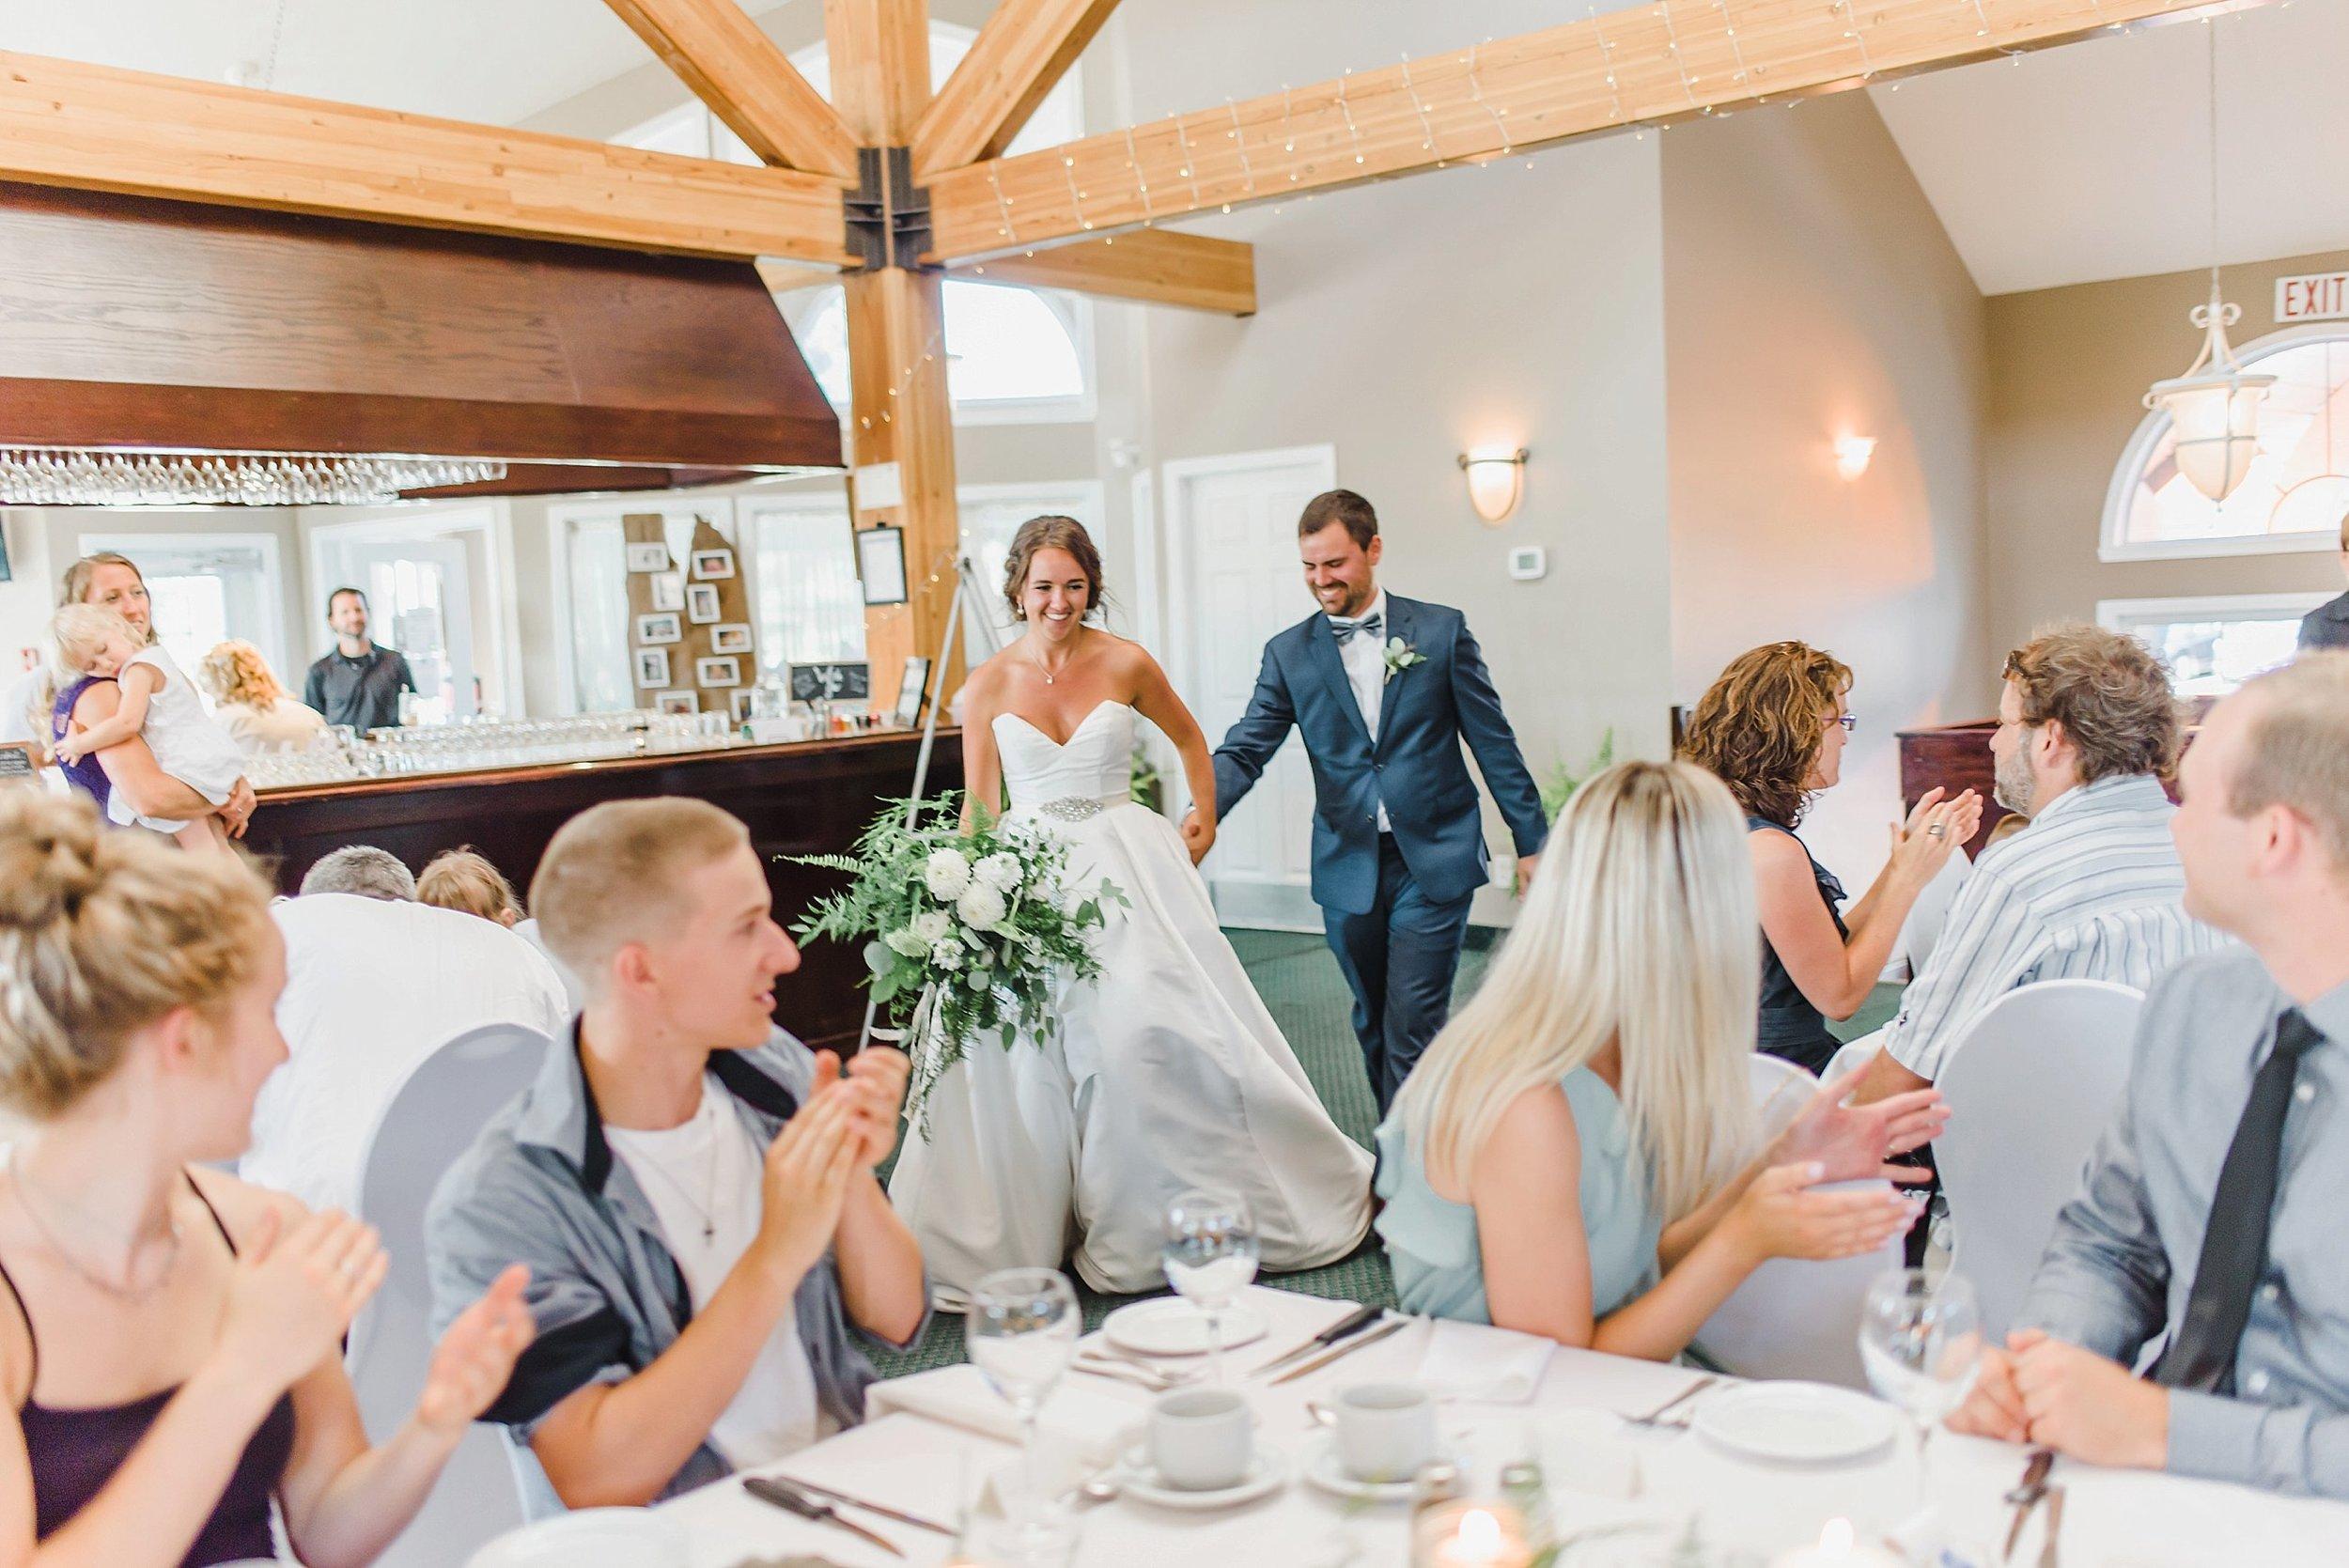 light airy indie fine art ottawa wedding photographer | Ali and Batoul Photography_0554.jpg